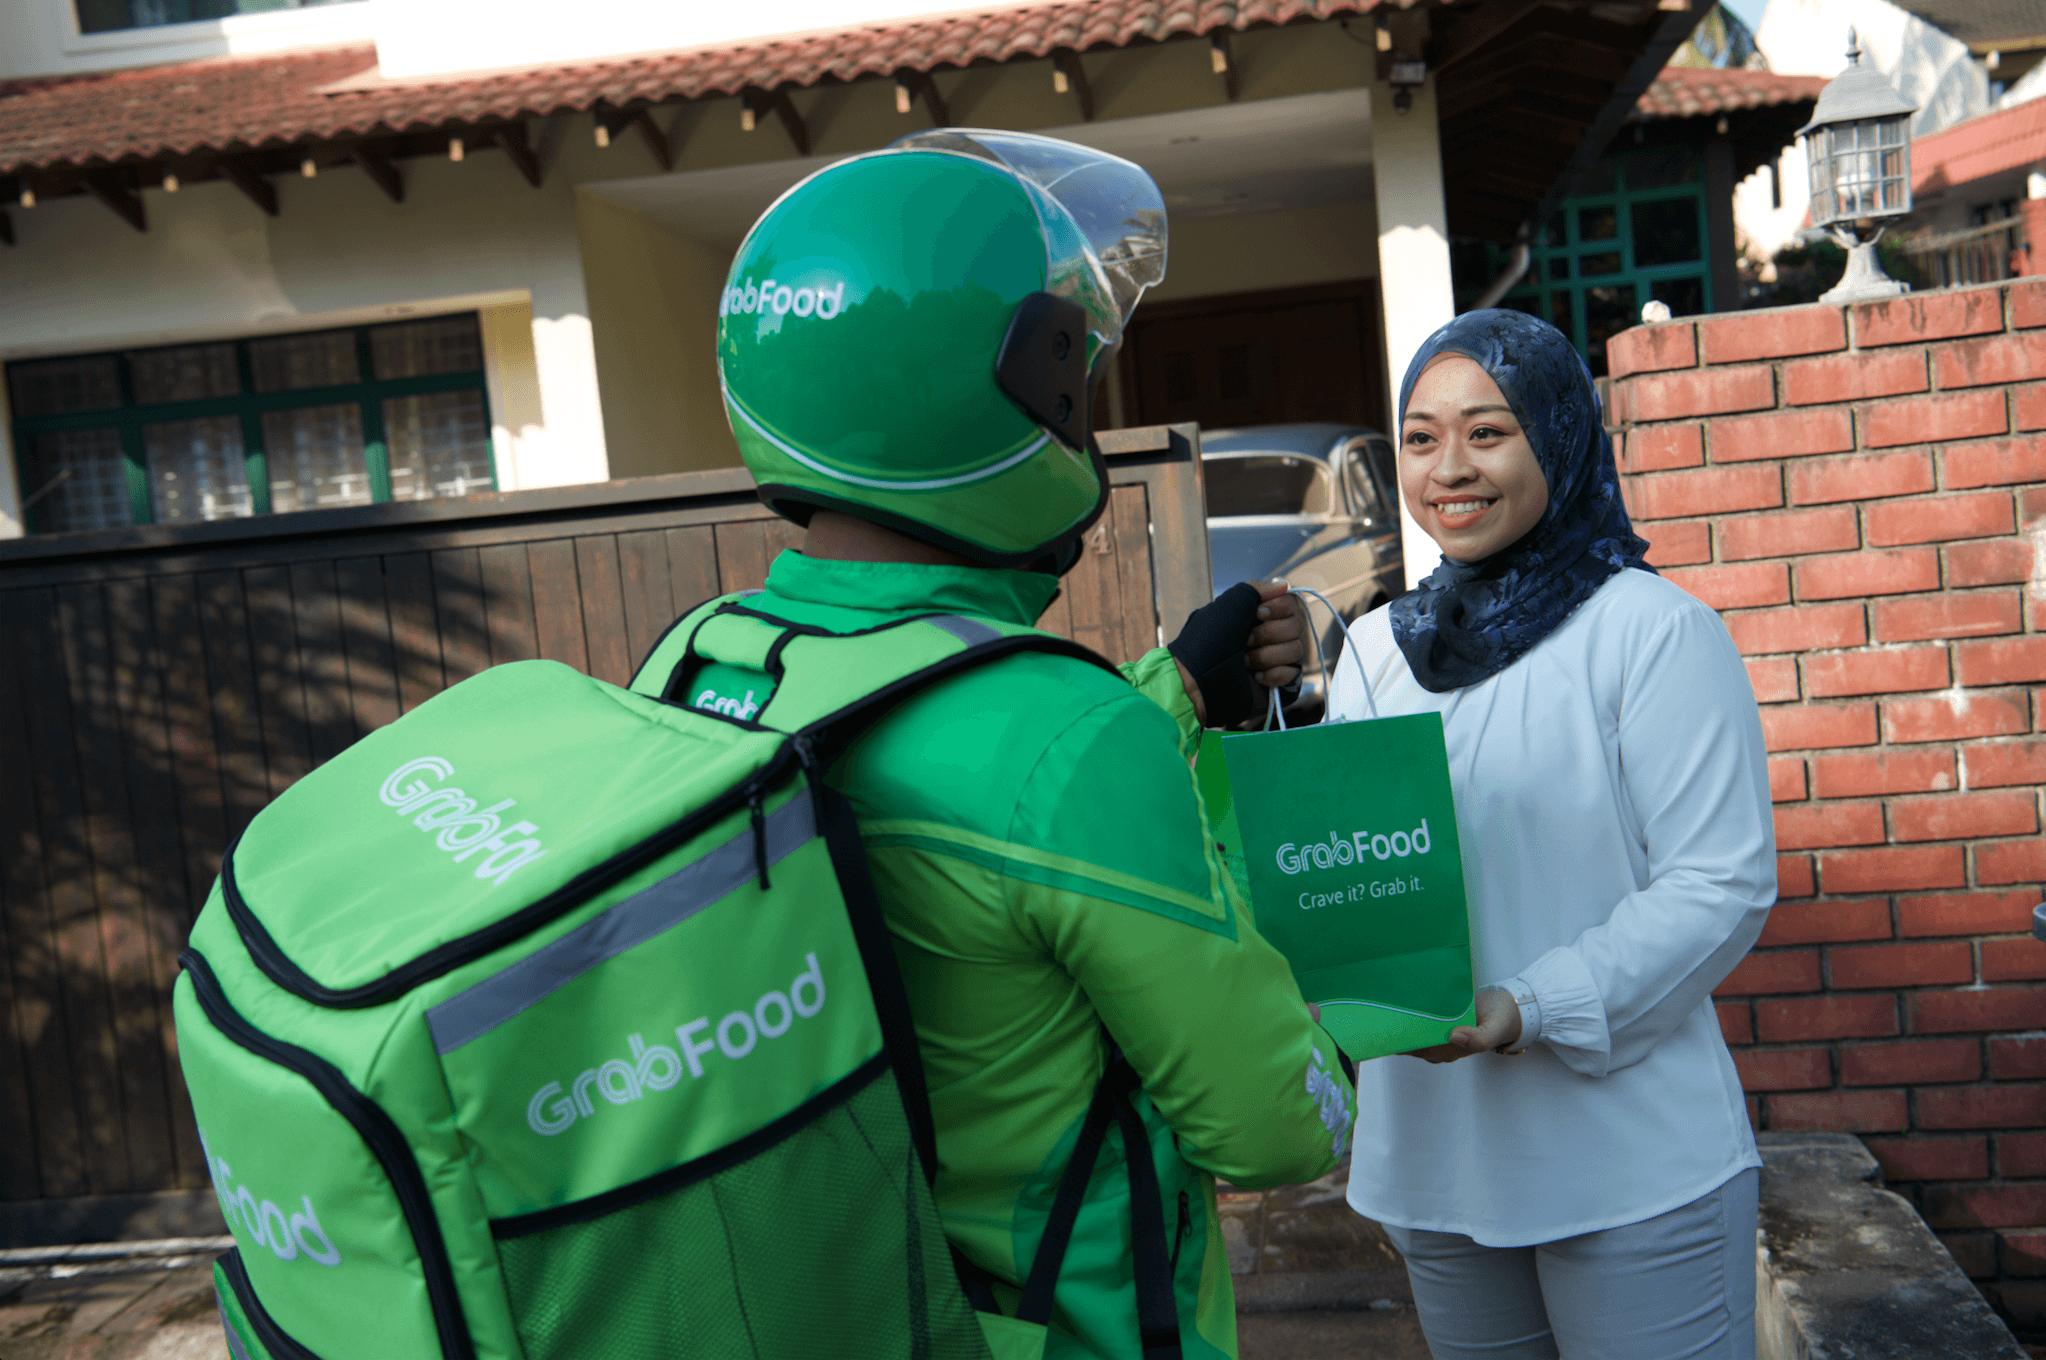 Grab, Heineken announce strategic partnership in SE Asia